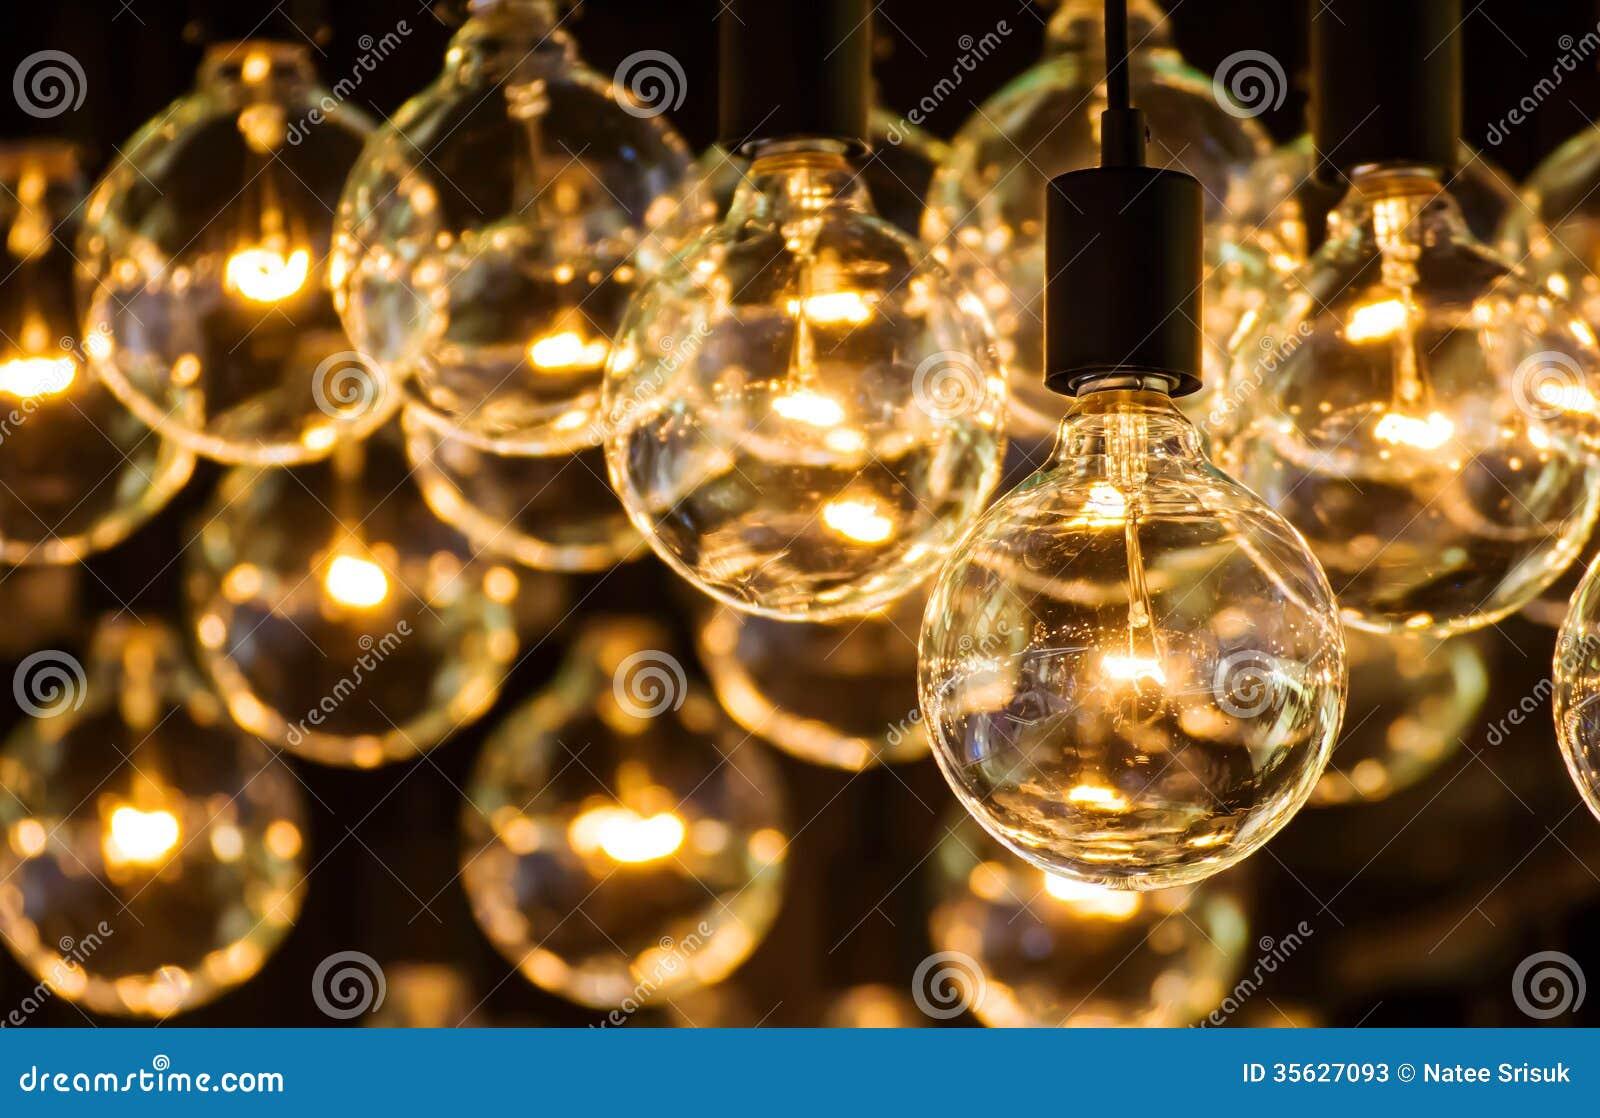 How lighting can optimize your work efficiency u standard